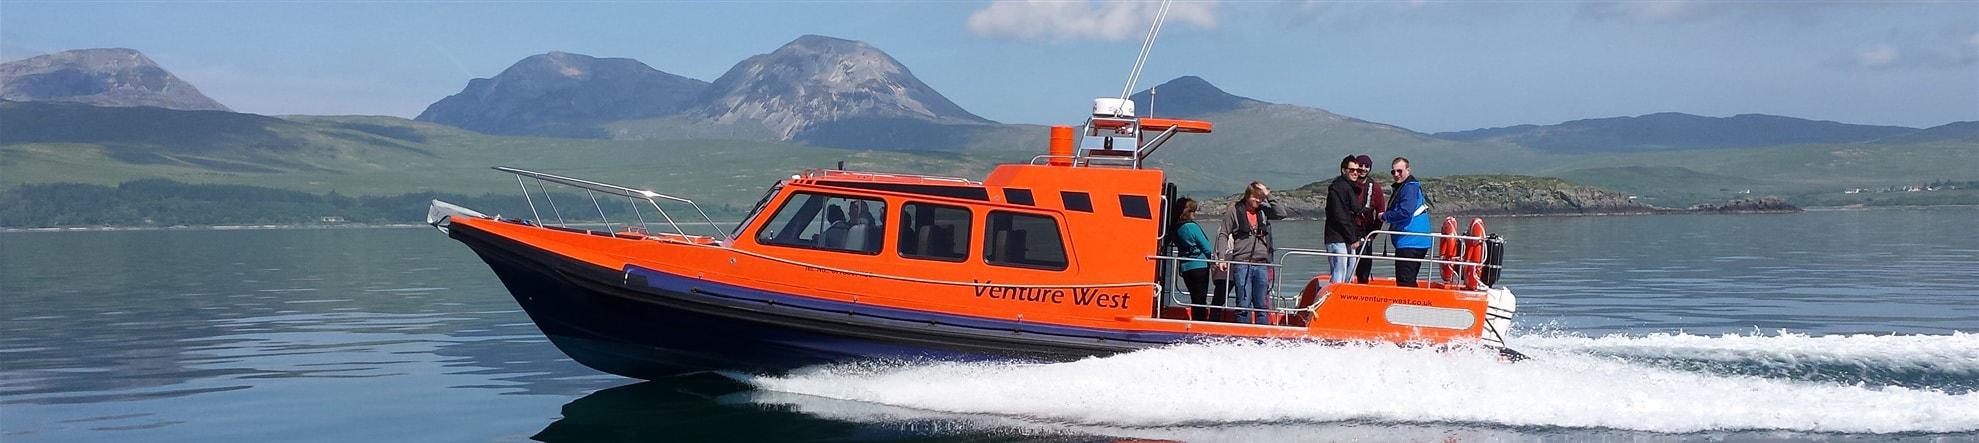 Boat Trips - Venture West